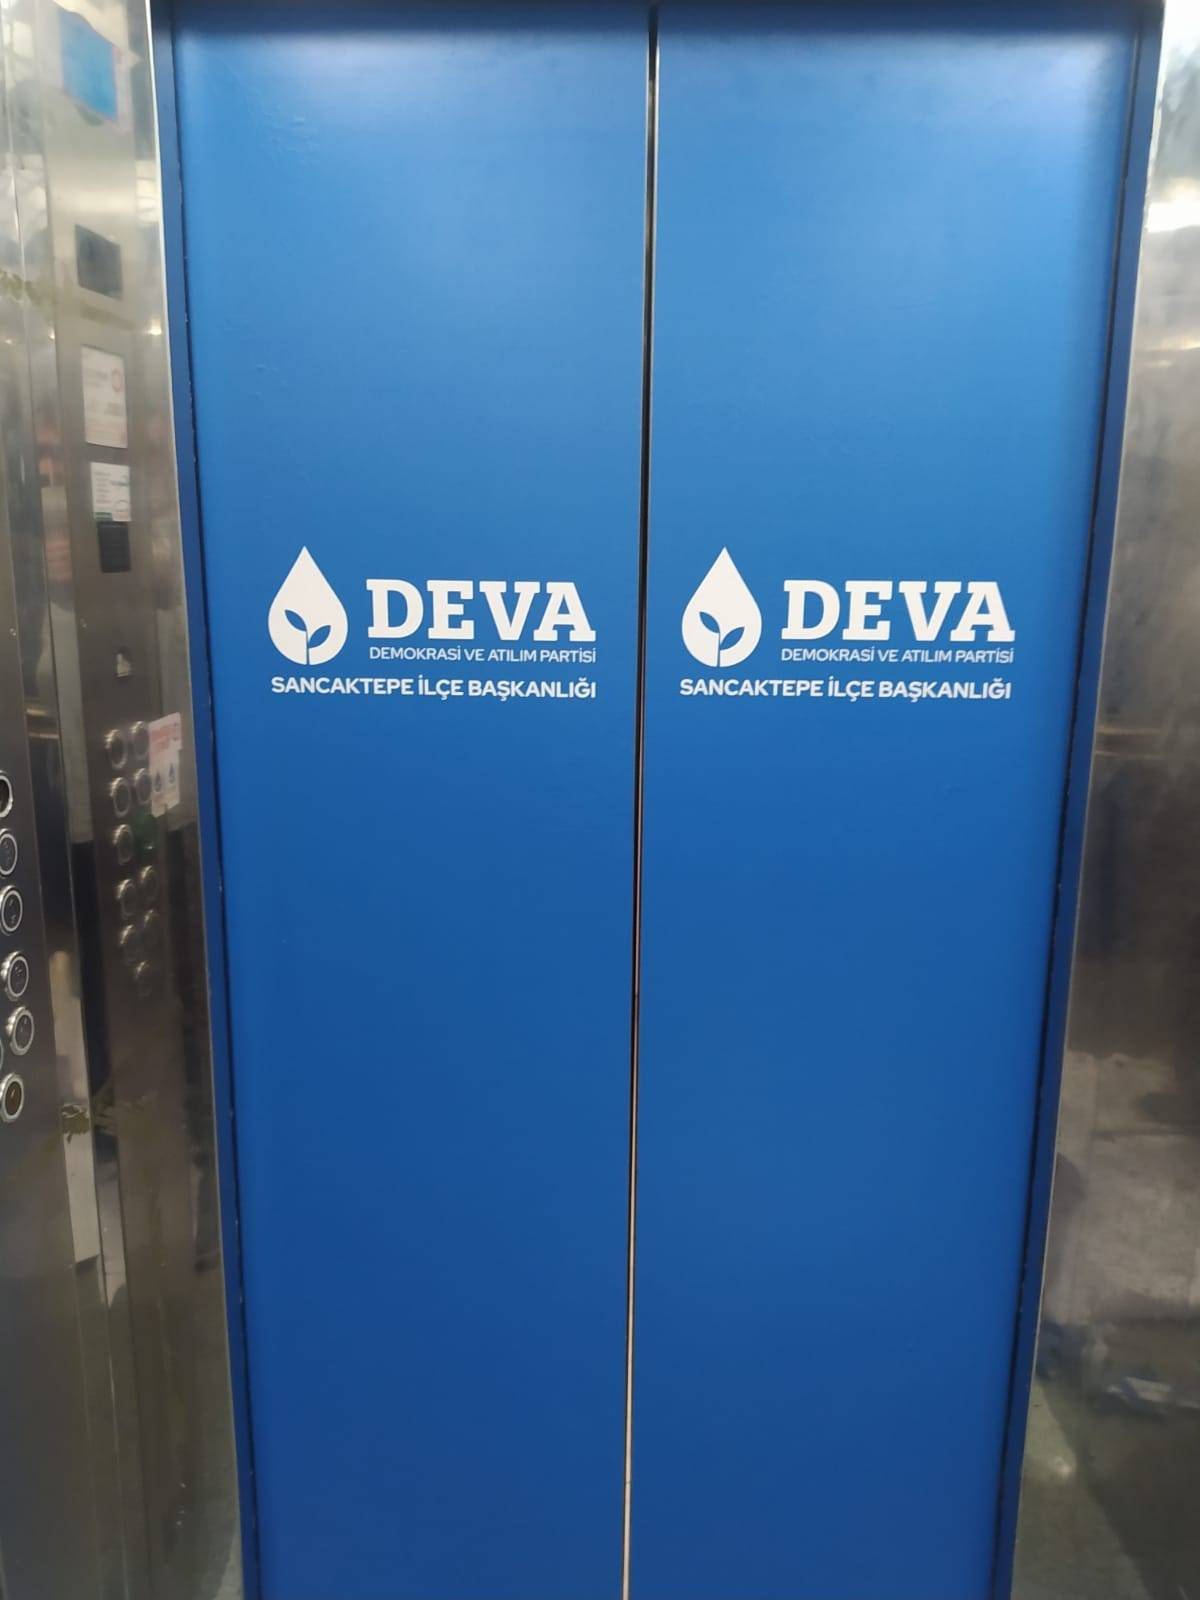 Asansör kapı kaplama reklam